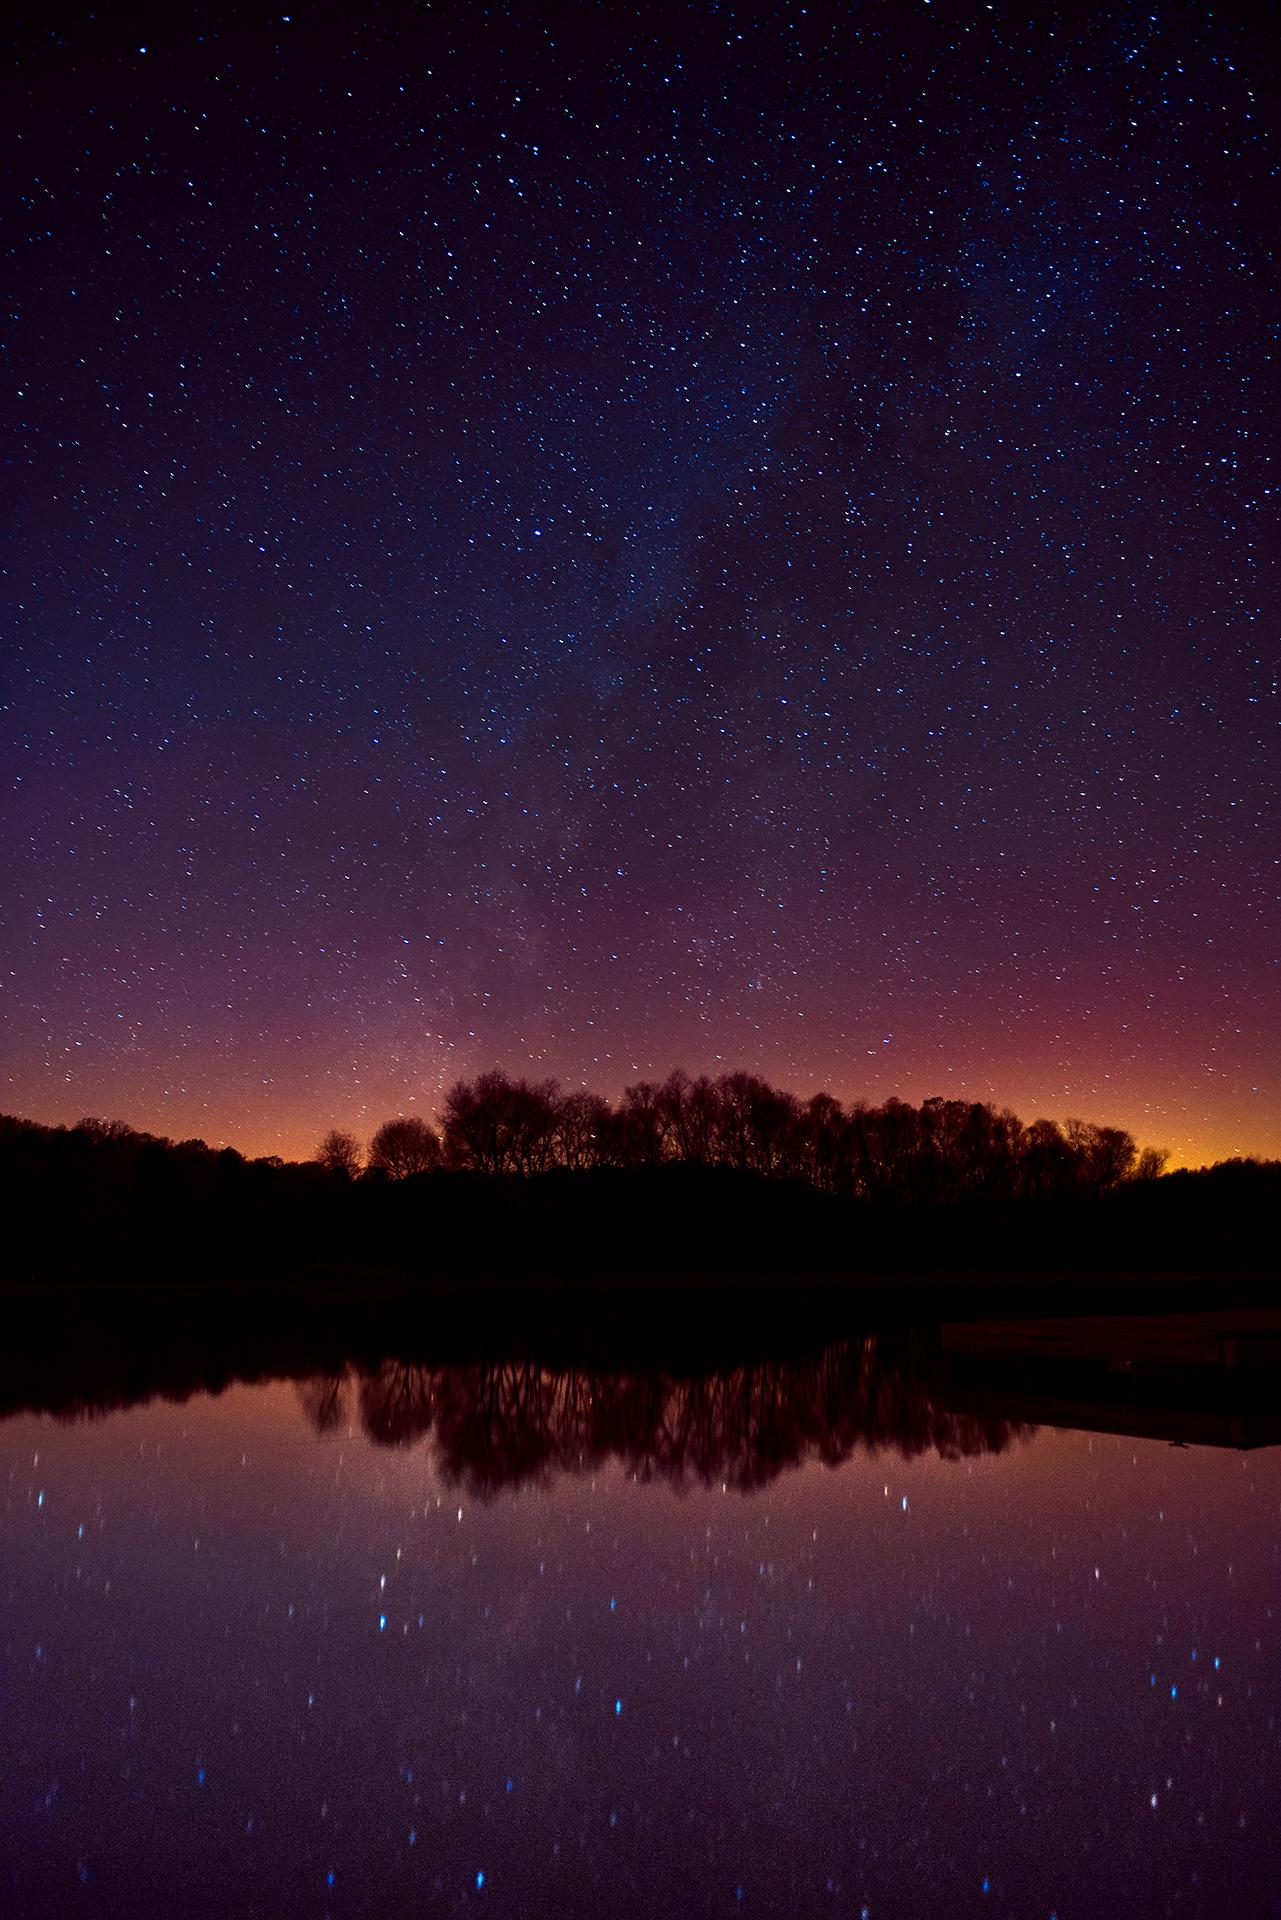 Under the Milky Way - Snake Creek Park